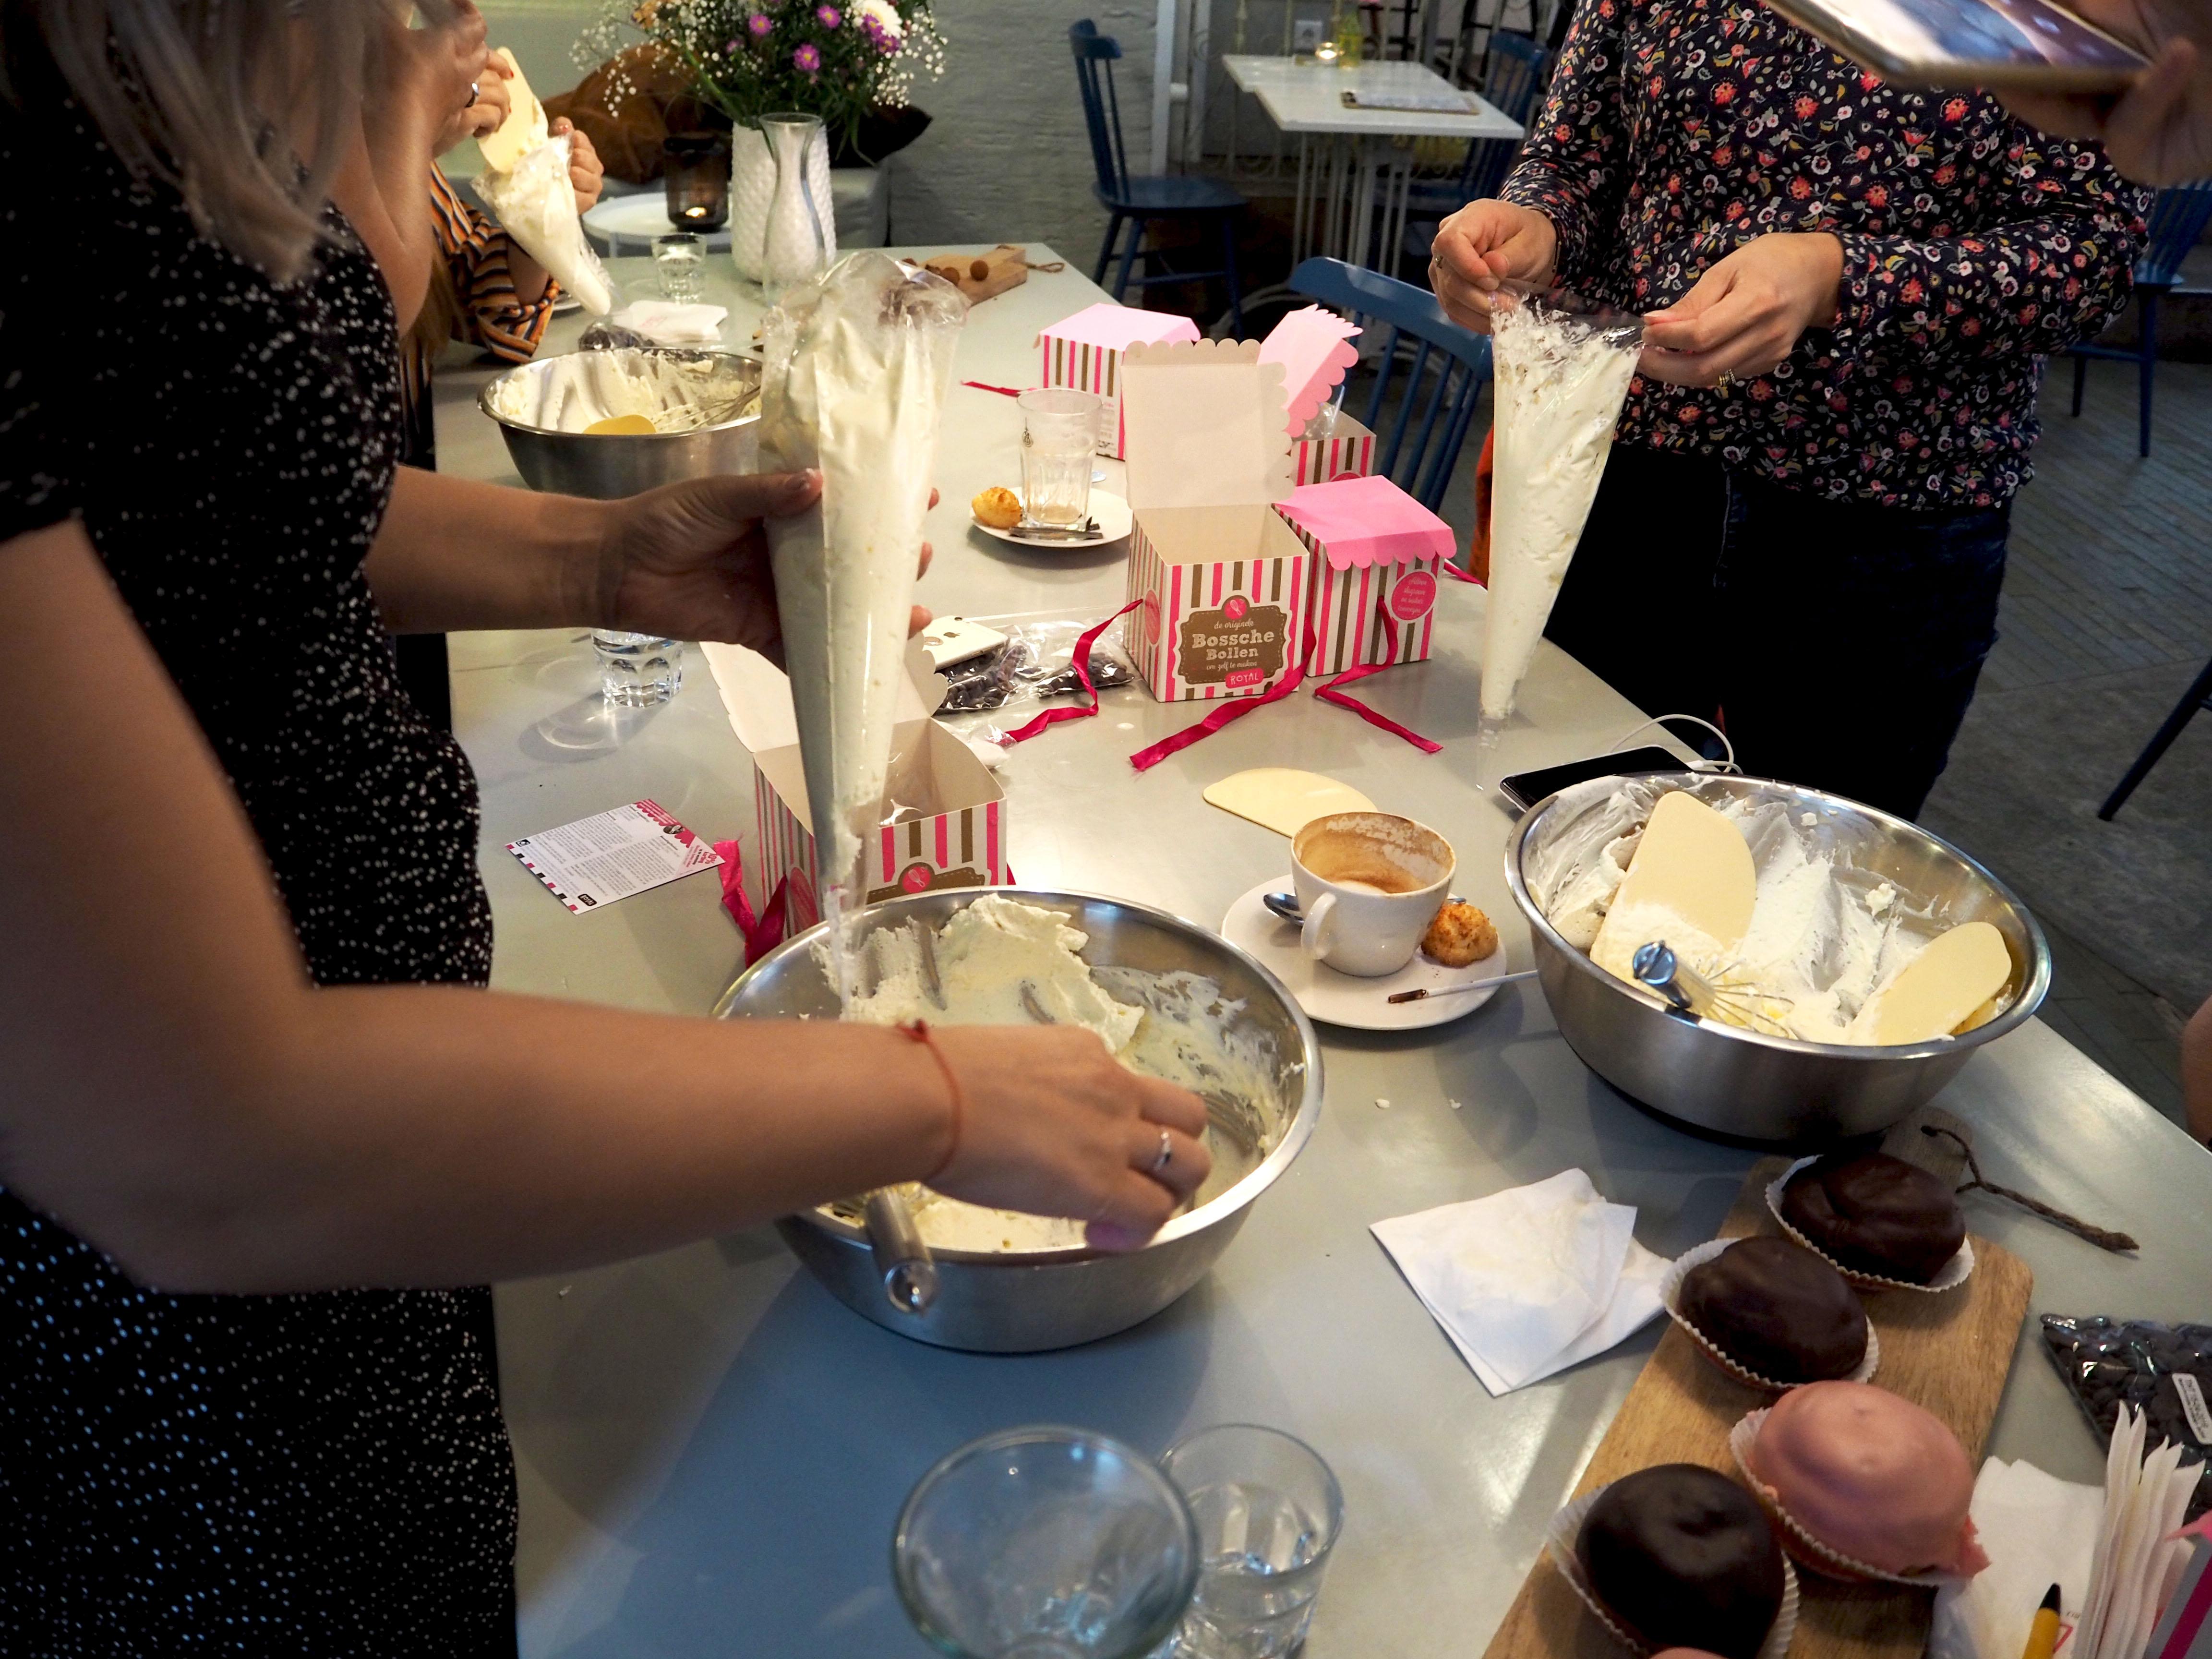 sjeklade bollen workshop bij bakkerij royal